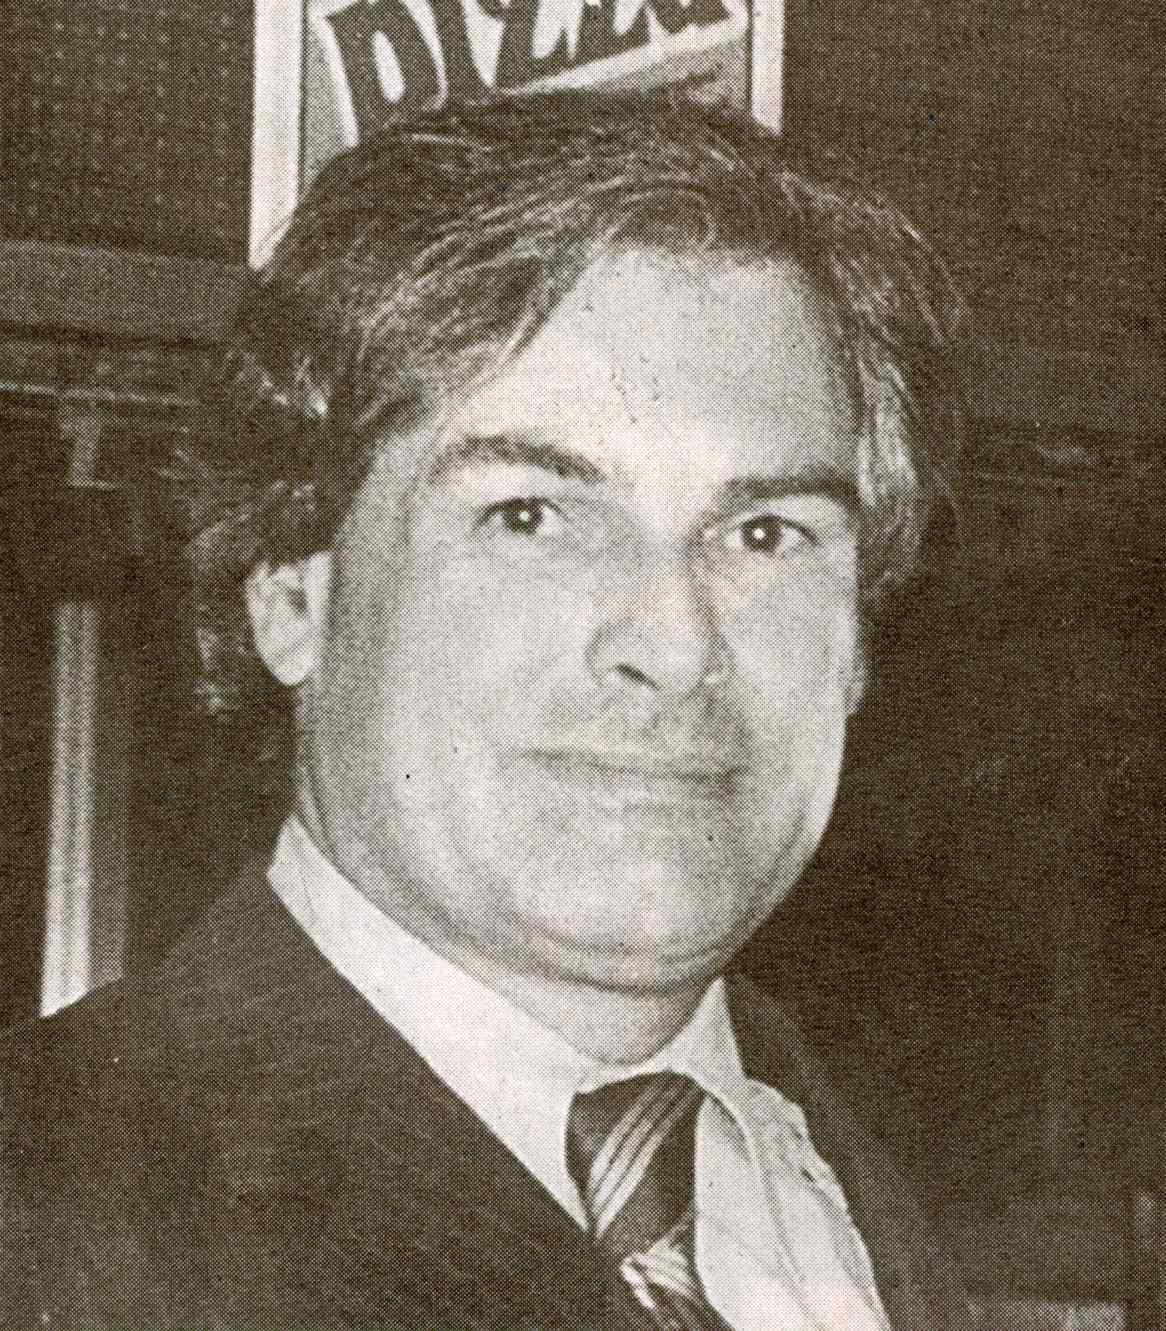 william doolittle, who was anti-APA